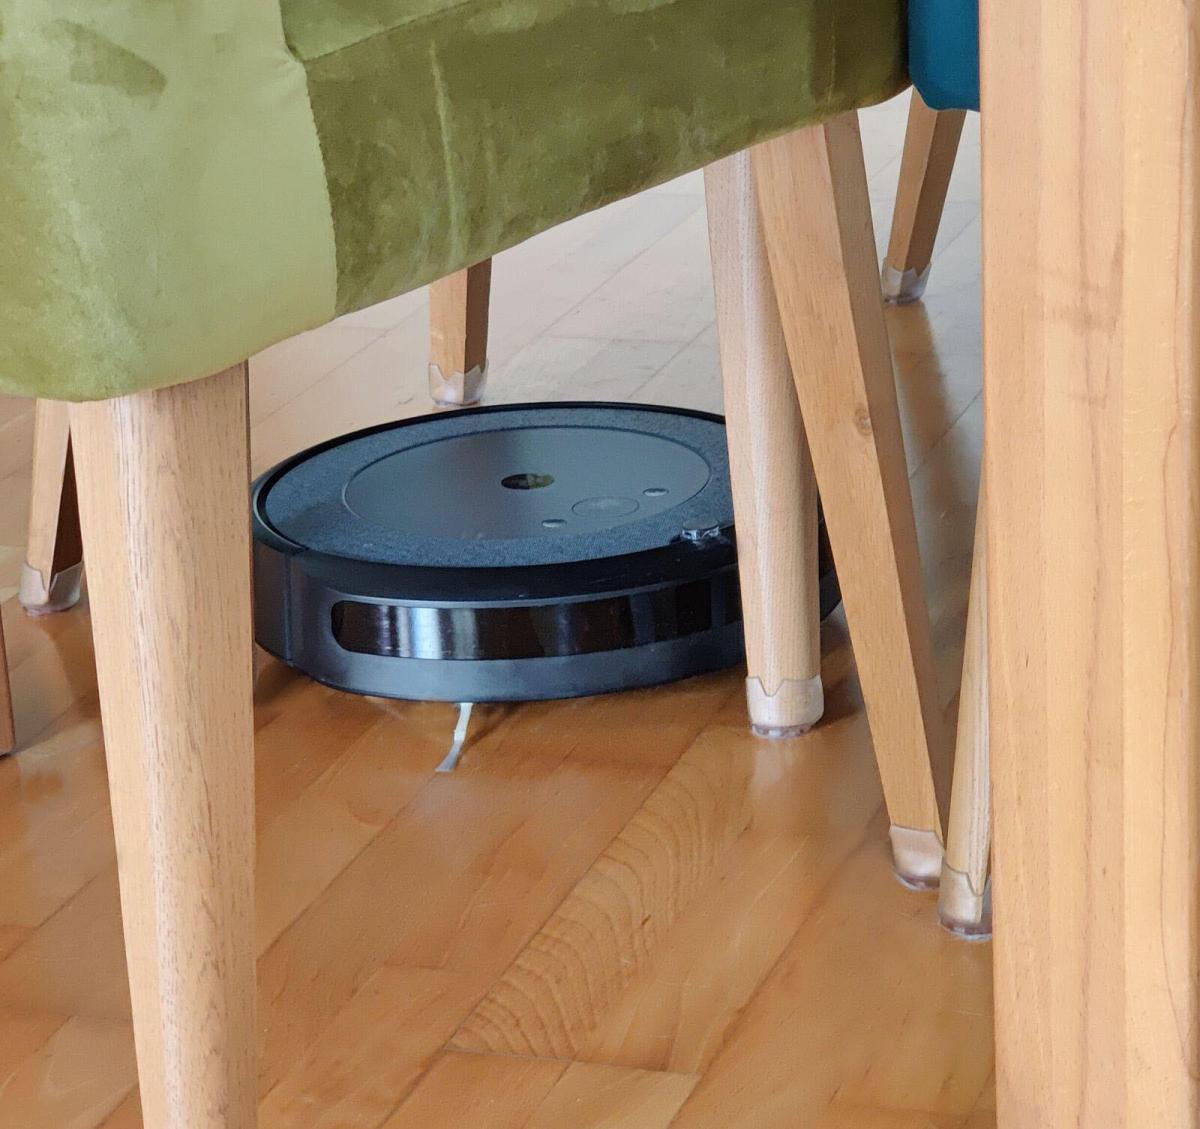 Irobot Roomba I3 Plus Steckengeblieben